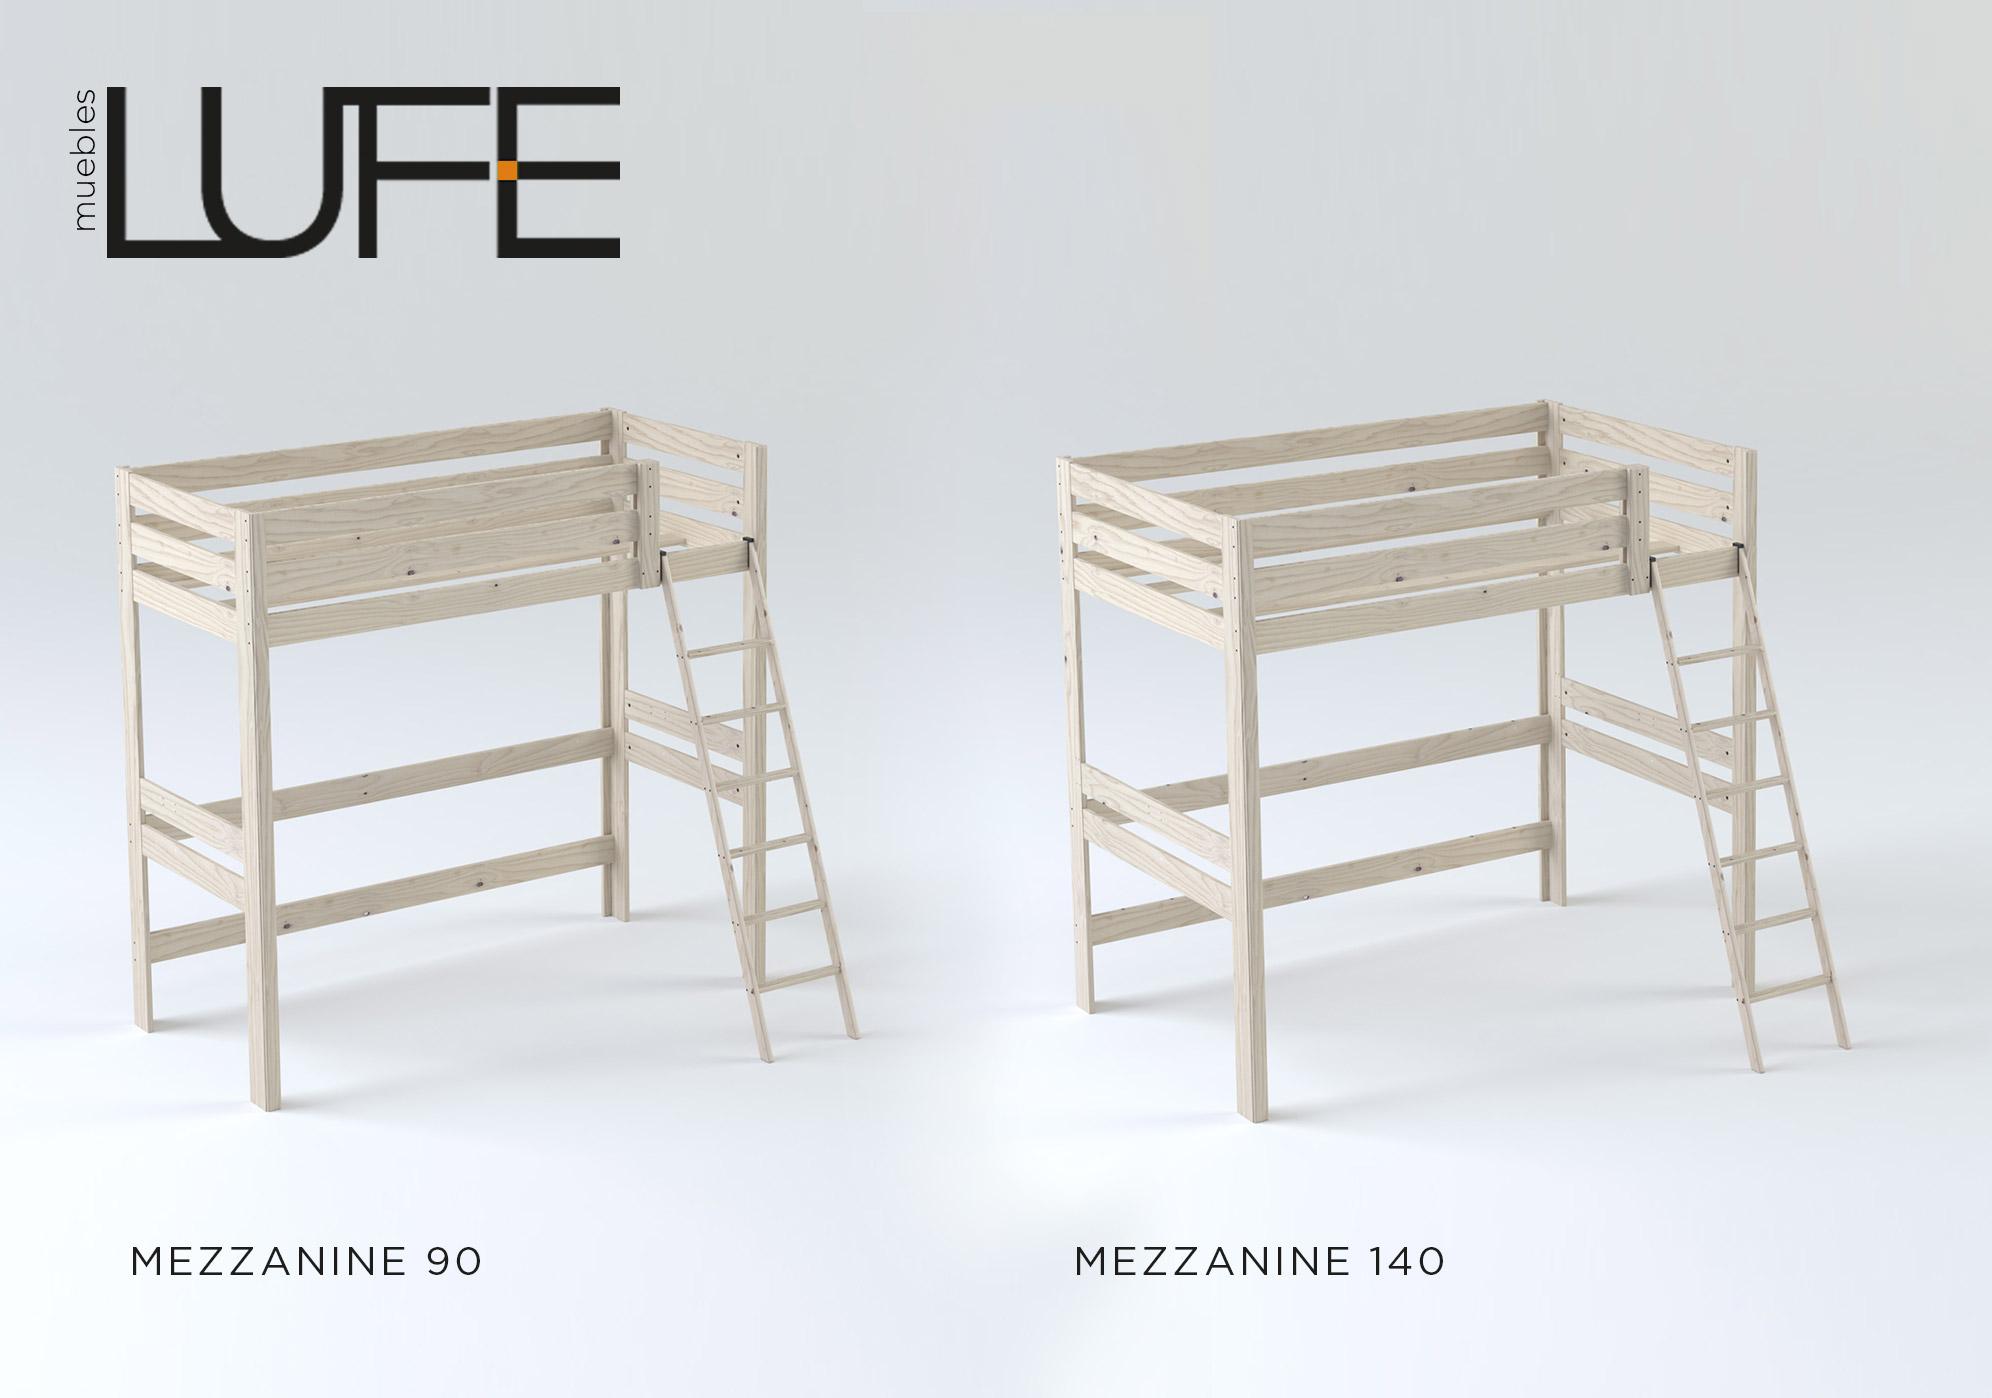 Muebles lufe cama nido obtenga ideas dise o de muebles - Muebles lufe azpeitia ...